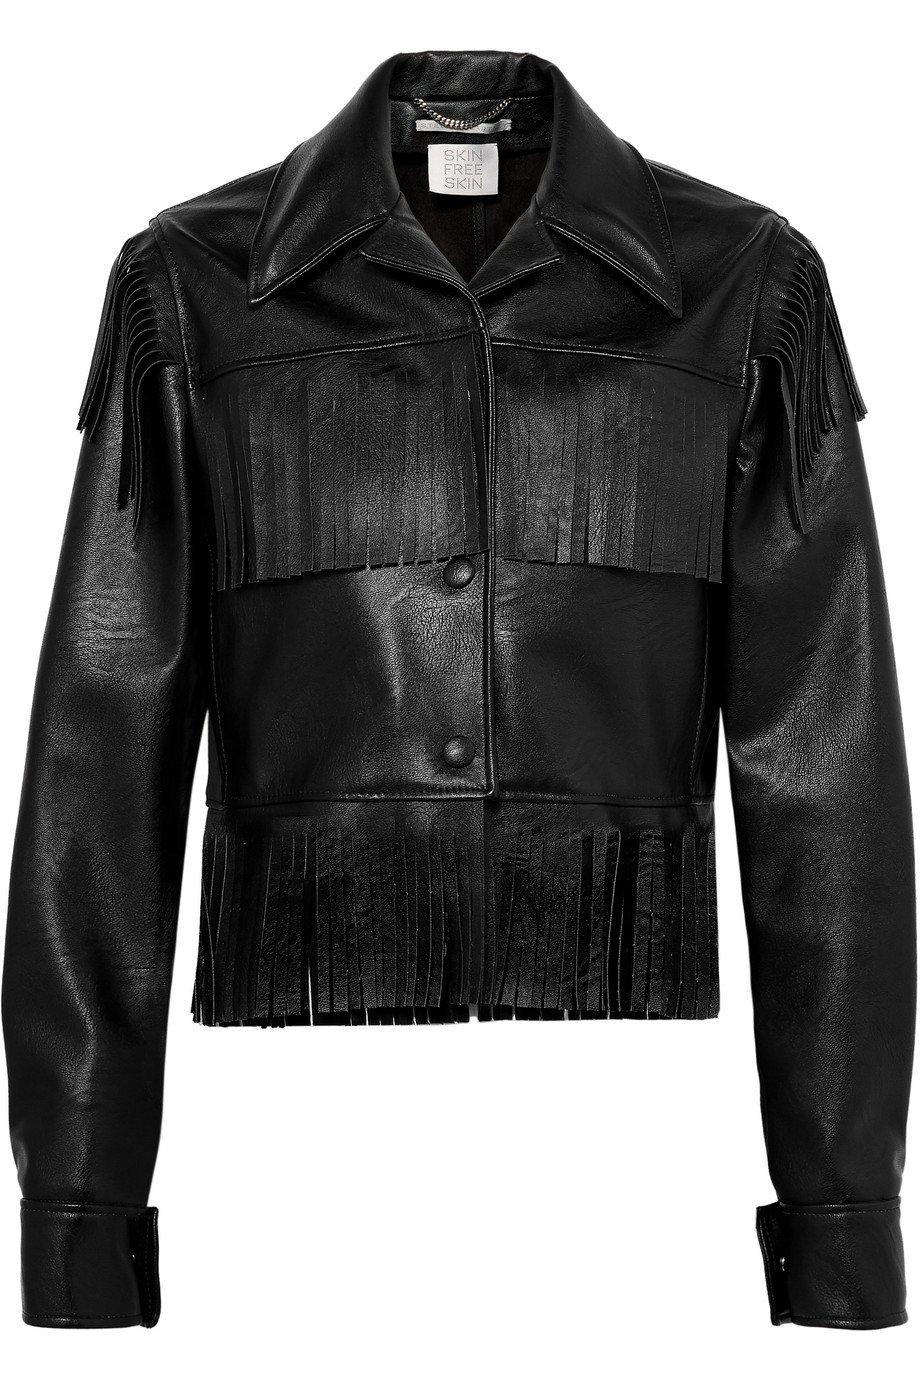 Stella McCartney | Fringed faux textured-leather jacket | NET-A-PORTER.COM